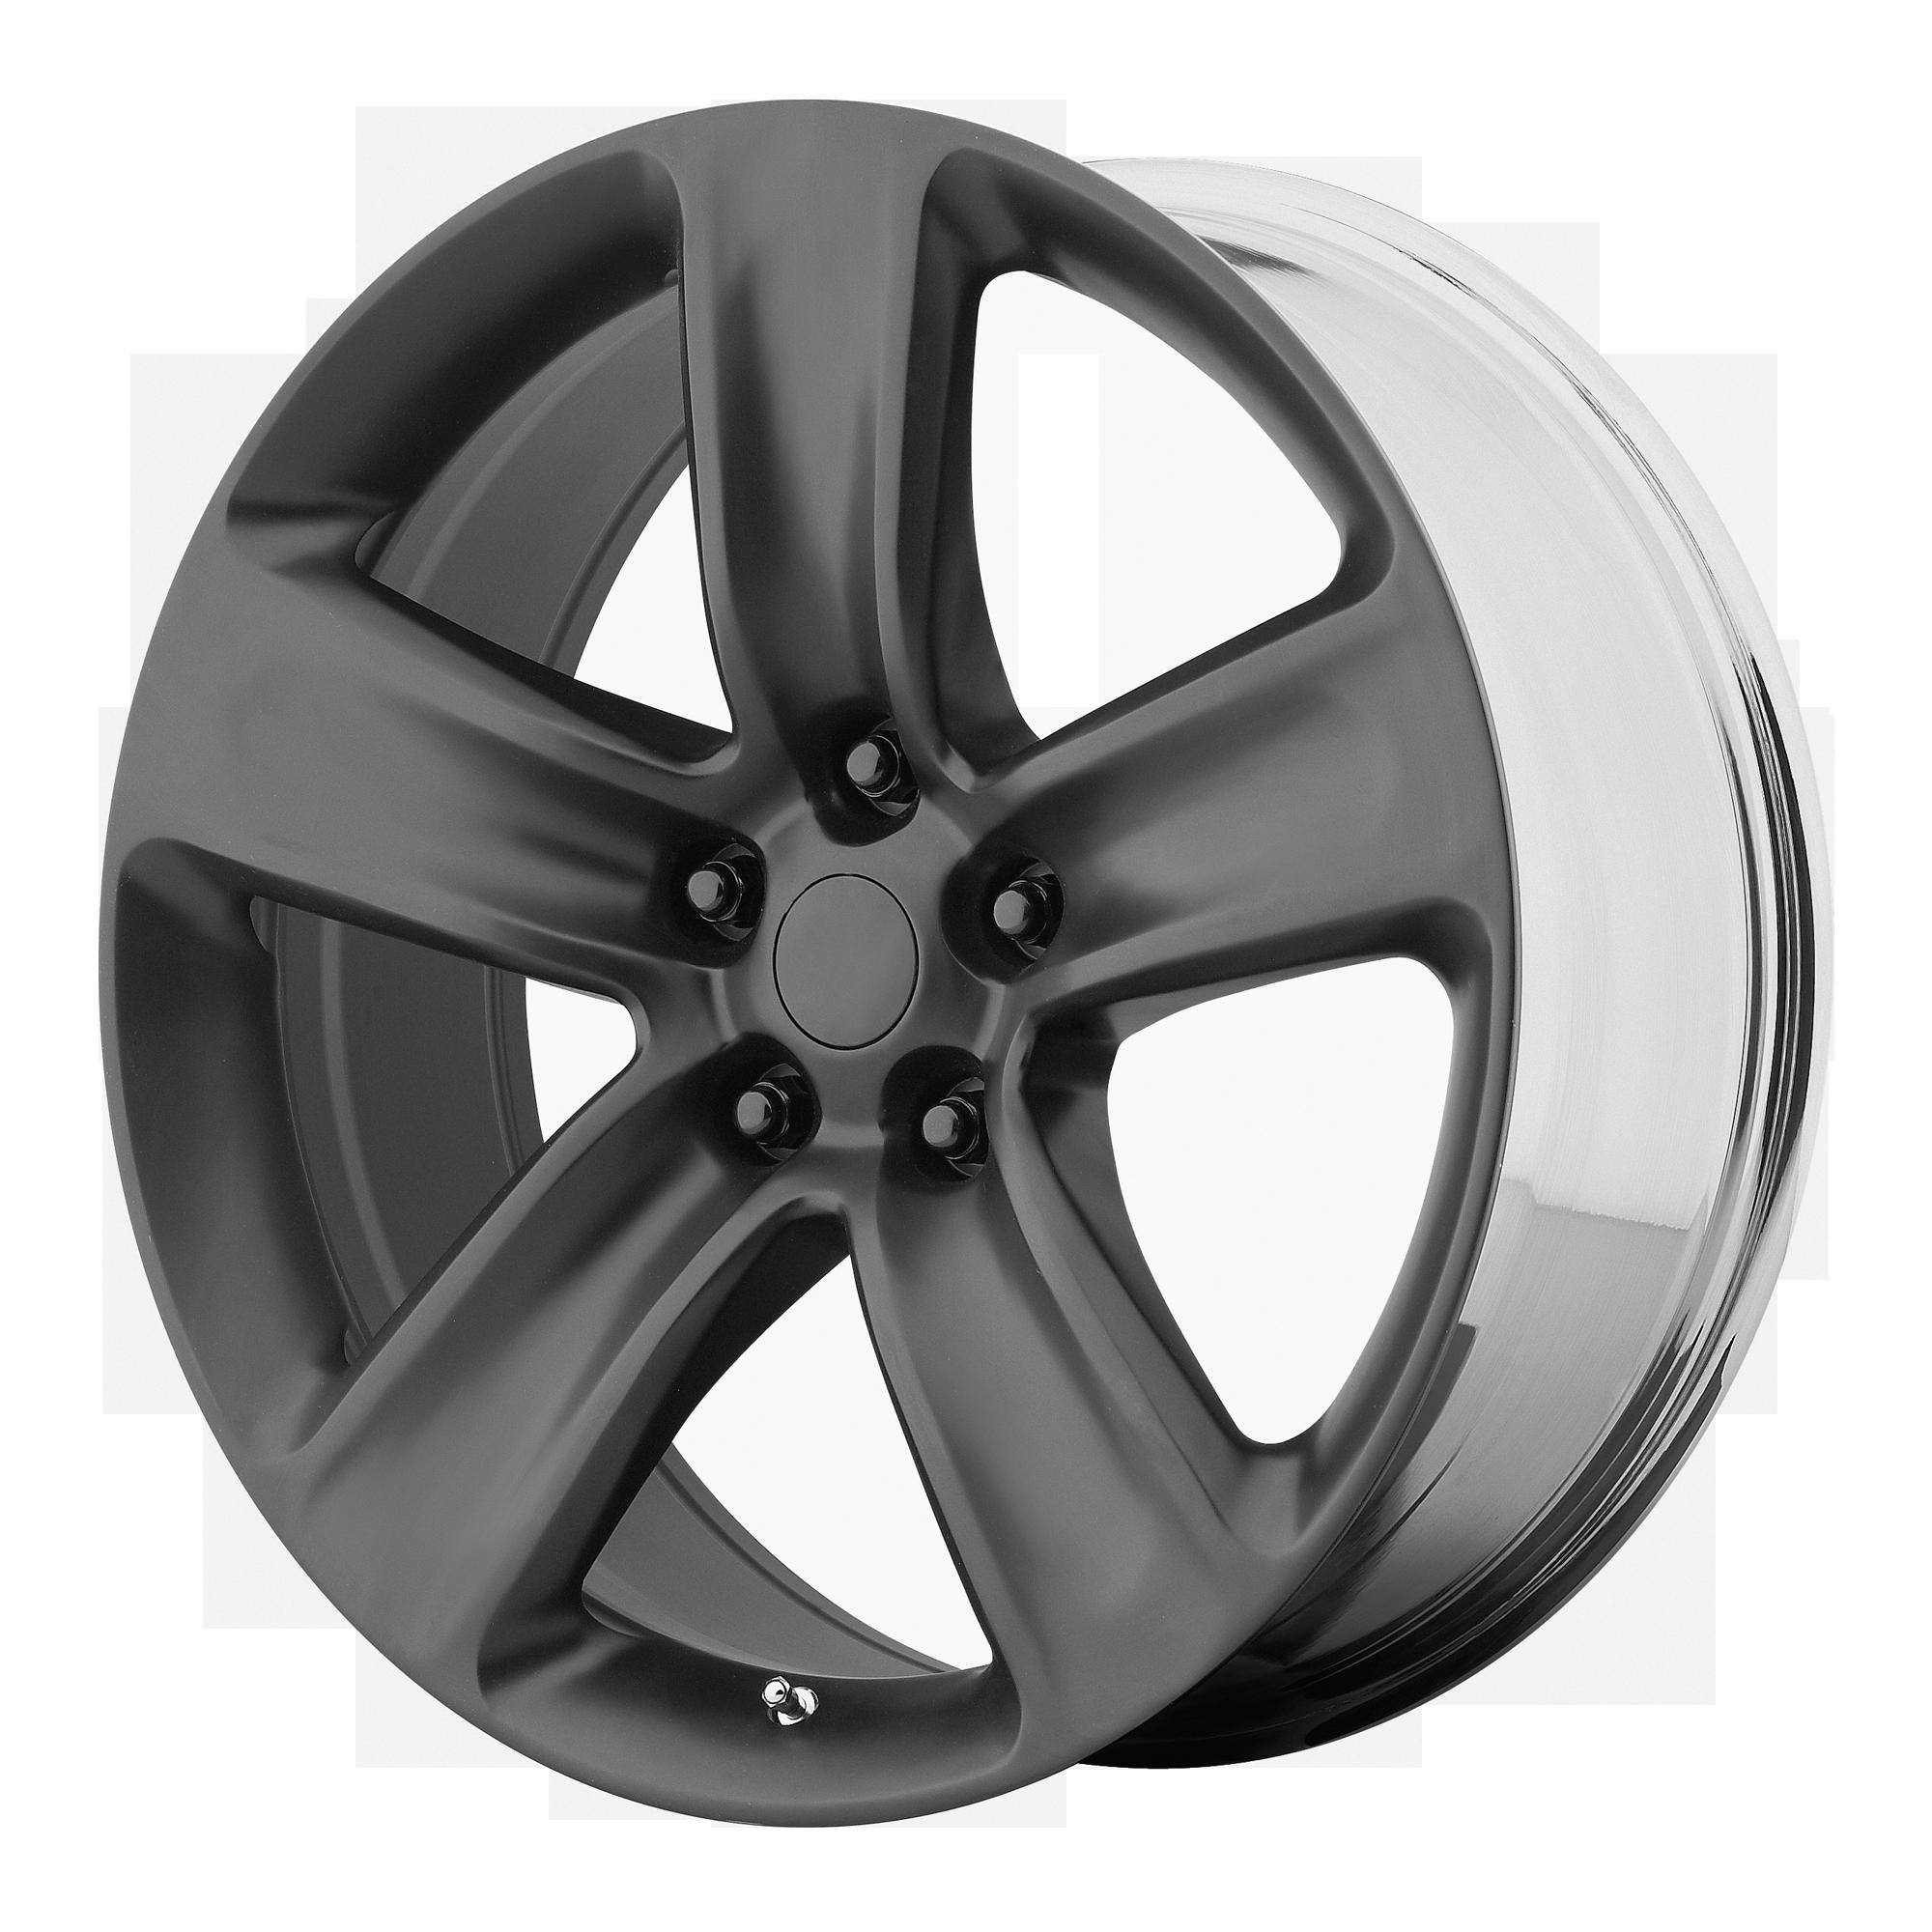 OE Creations Replica Wheels OE Creations PR154 Satin Black